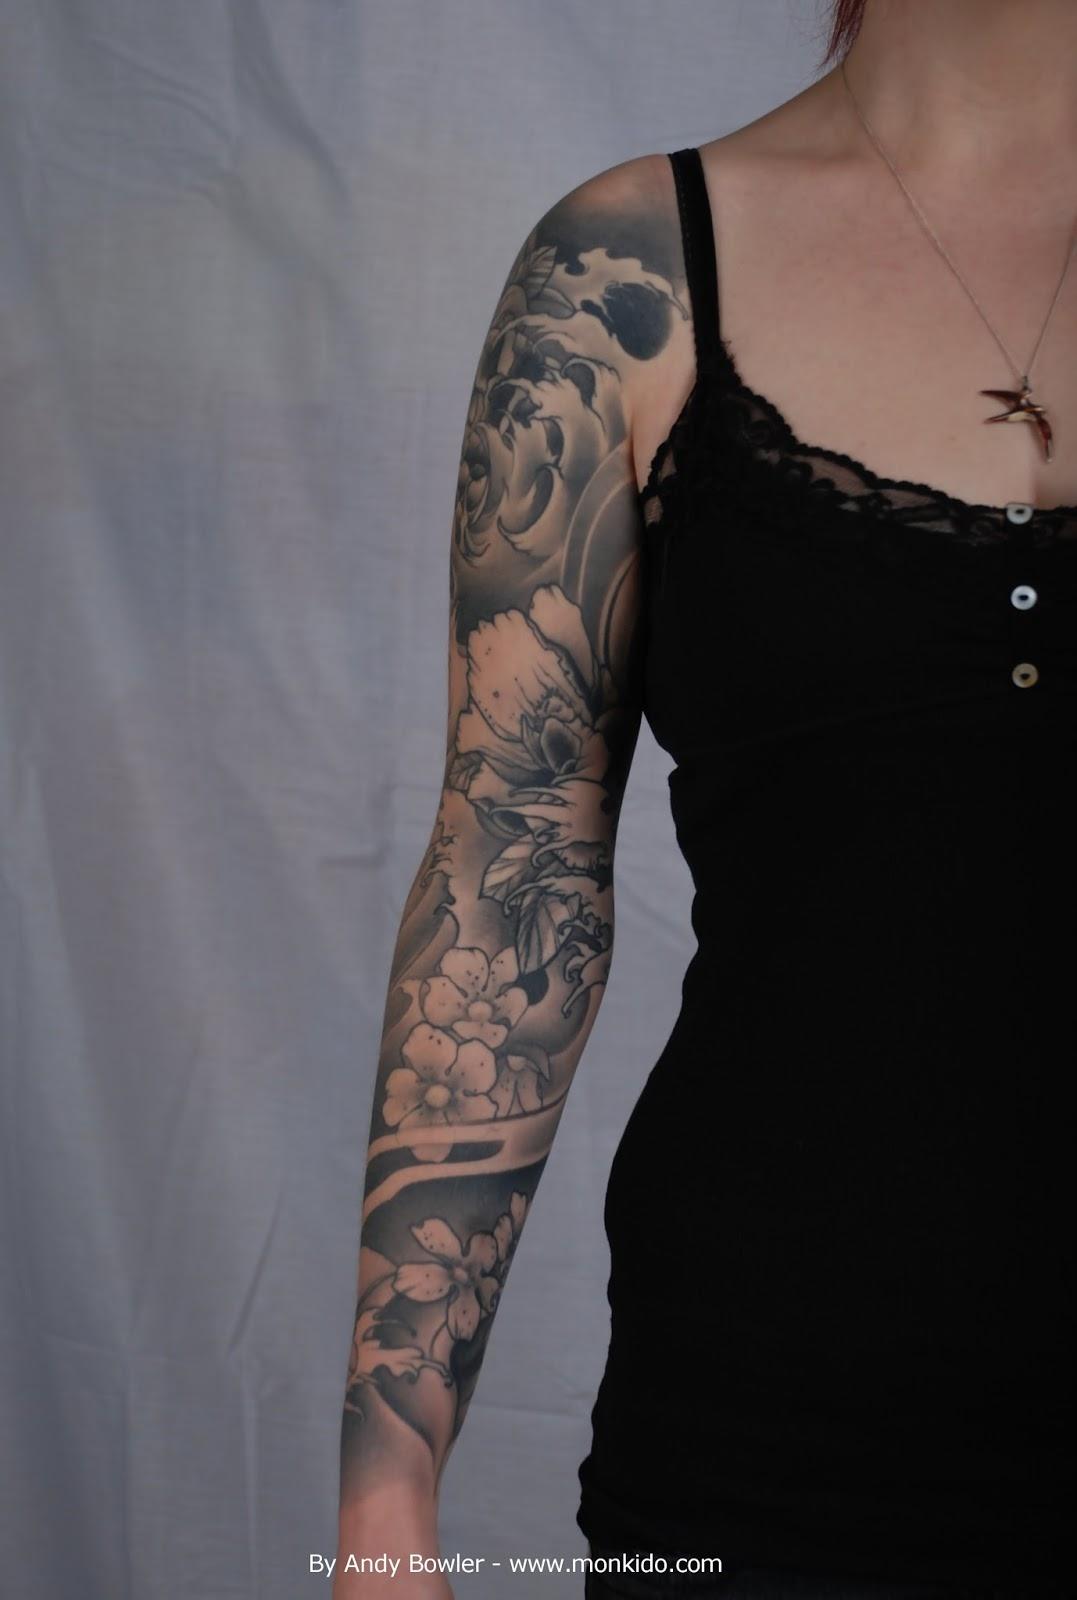 Monki Do Tattoo Studio: Custom Japanese Sleeve by Andy ...